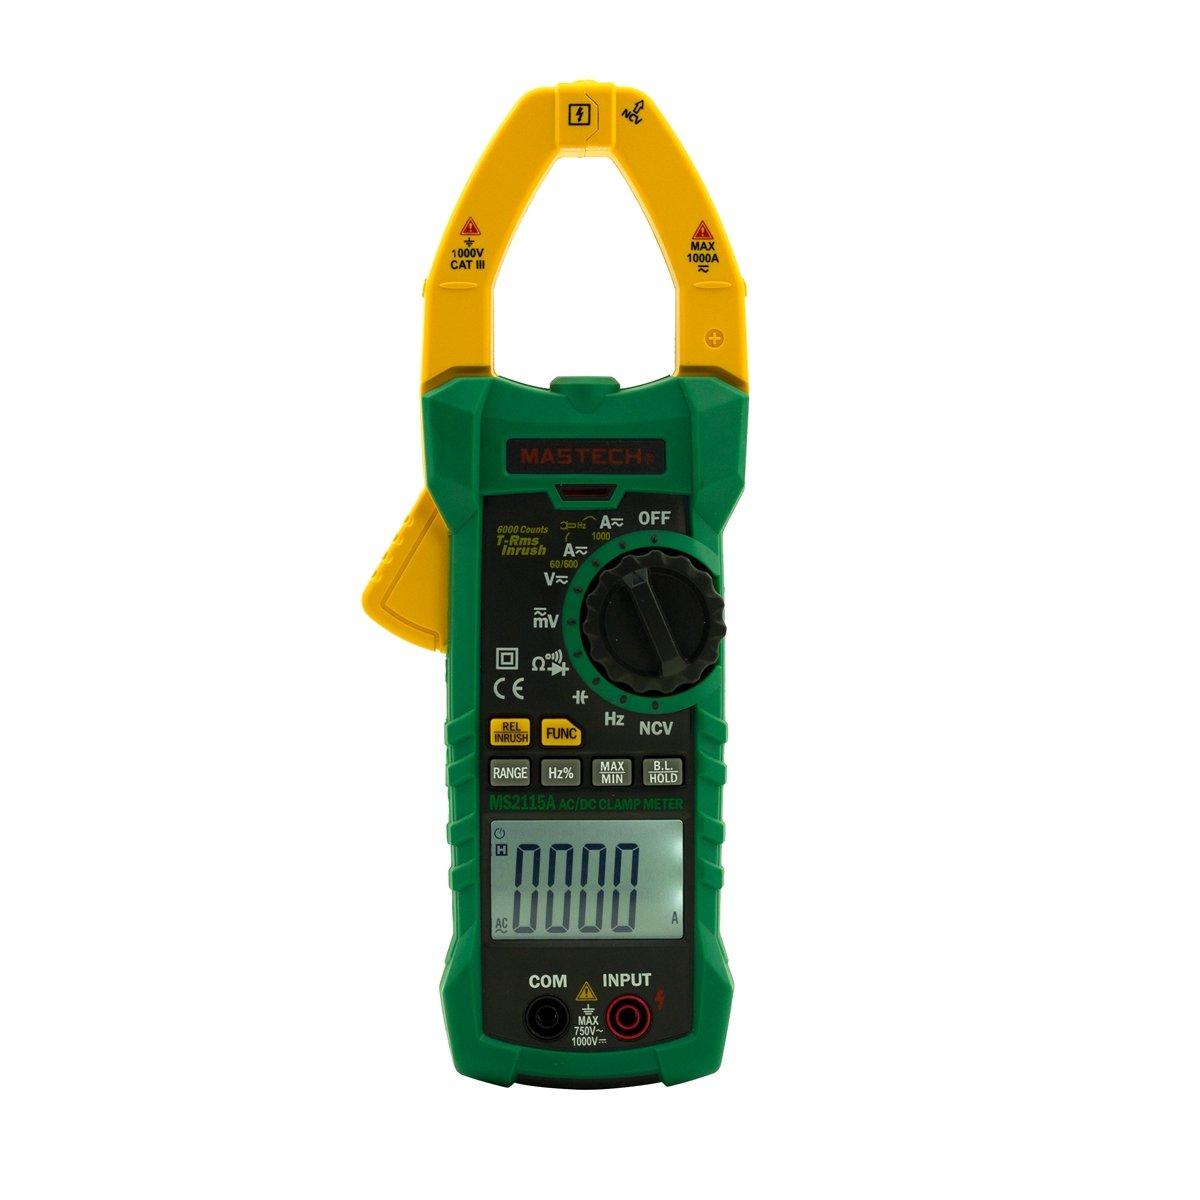 Mastech Ms2115a True Rms Digital Dc Ac Clamp Meters Multimeter Amp Ideal Receptacle Gfi Circuit Tester Voltagecontinuity Pricefalls Voltage R Hz